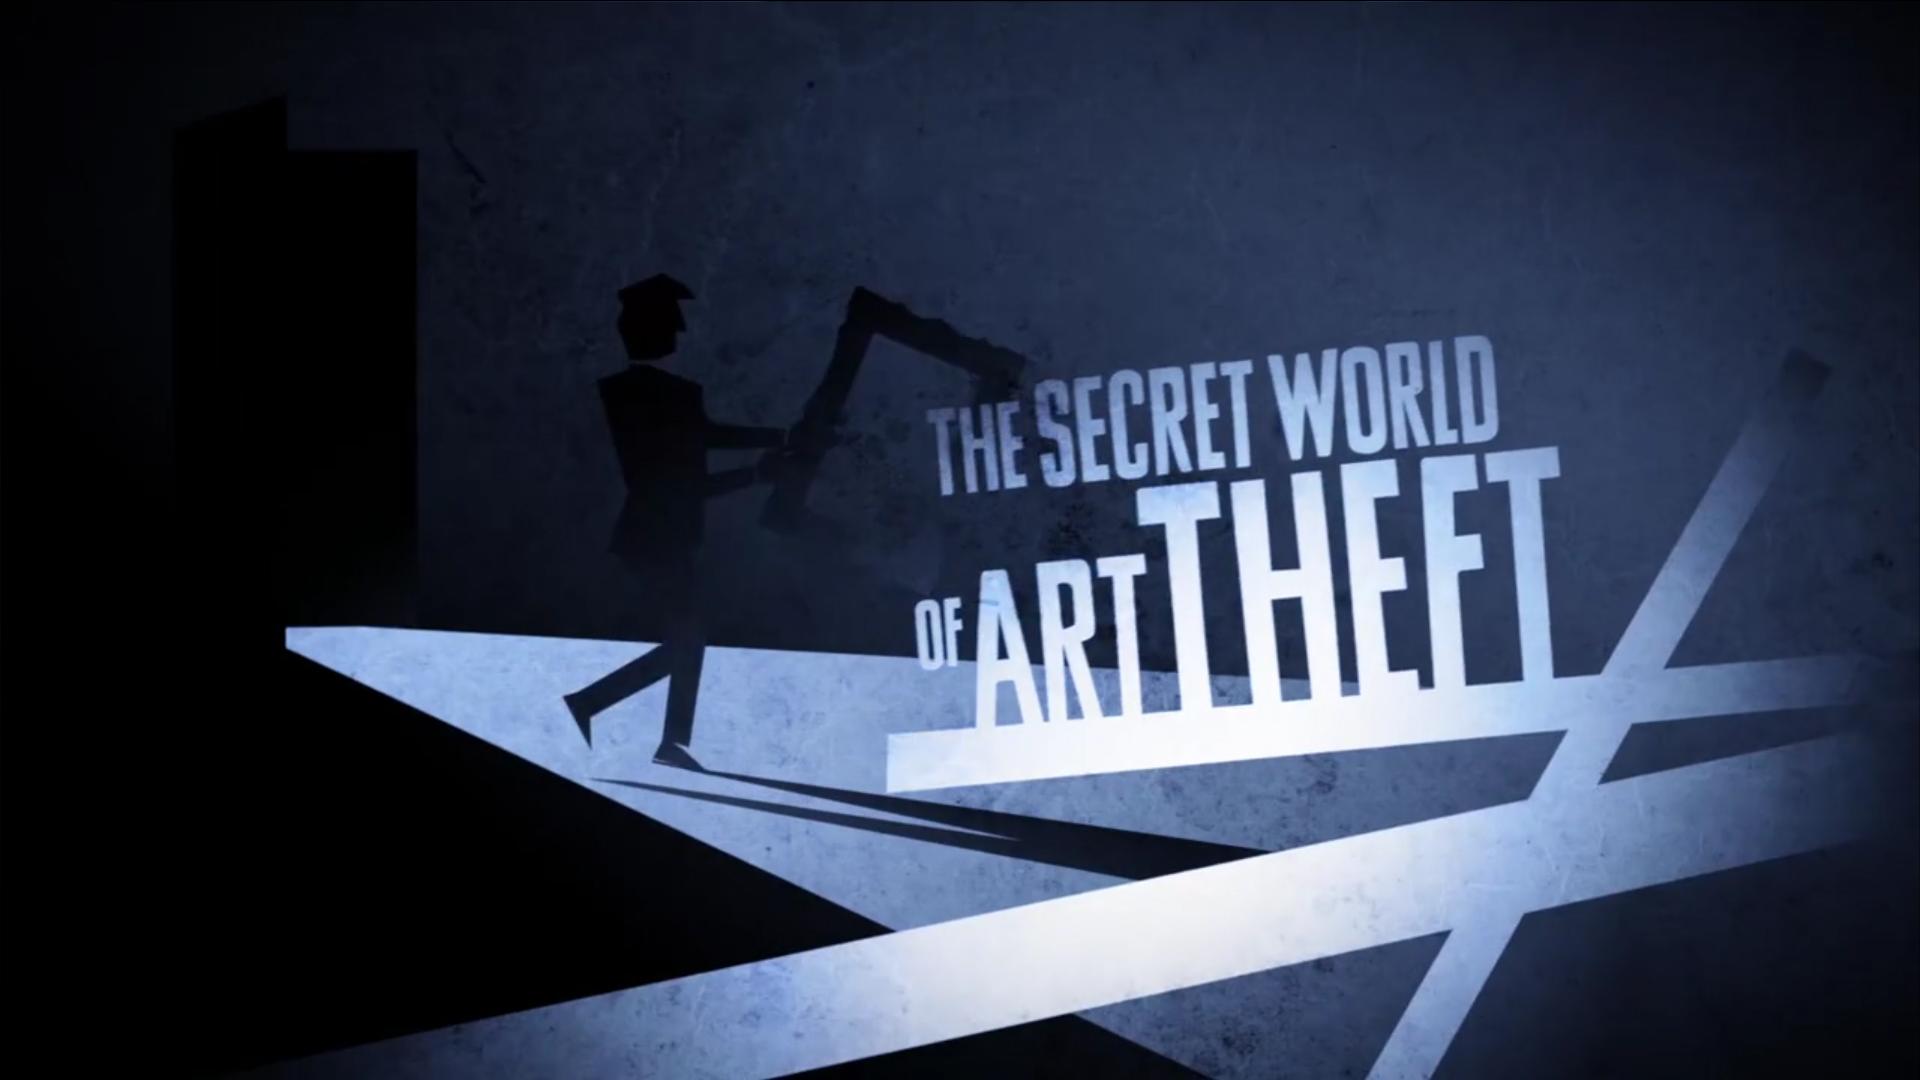 SECRET WORLD OF ART THEFT / BBC2